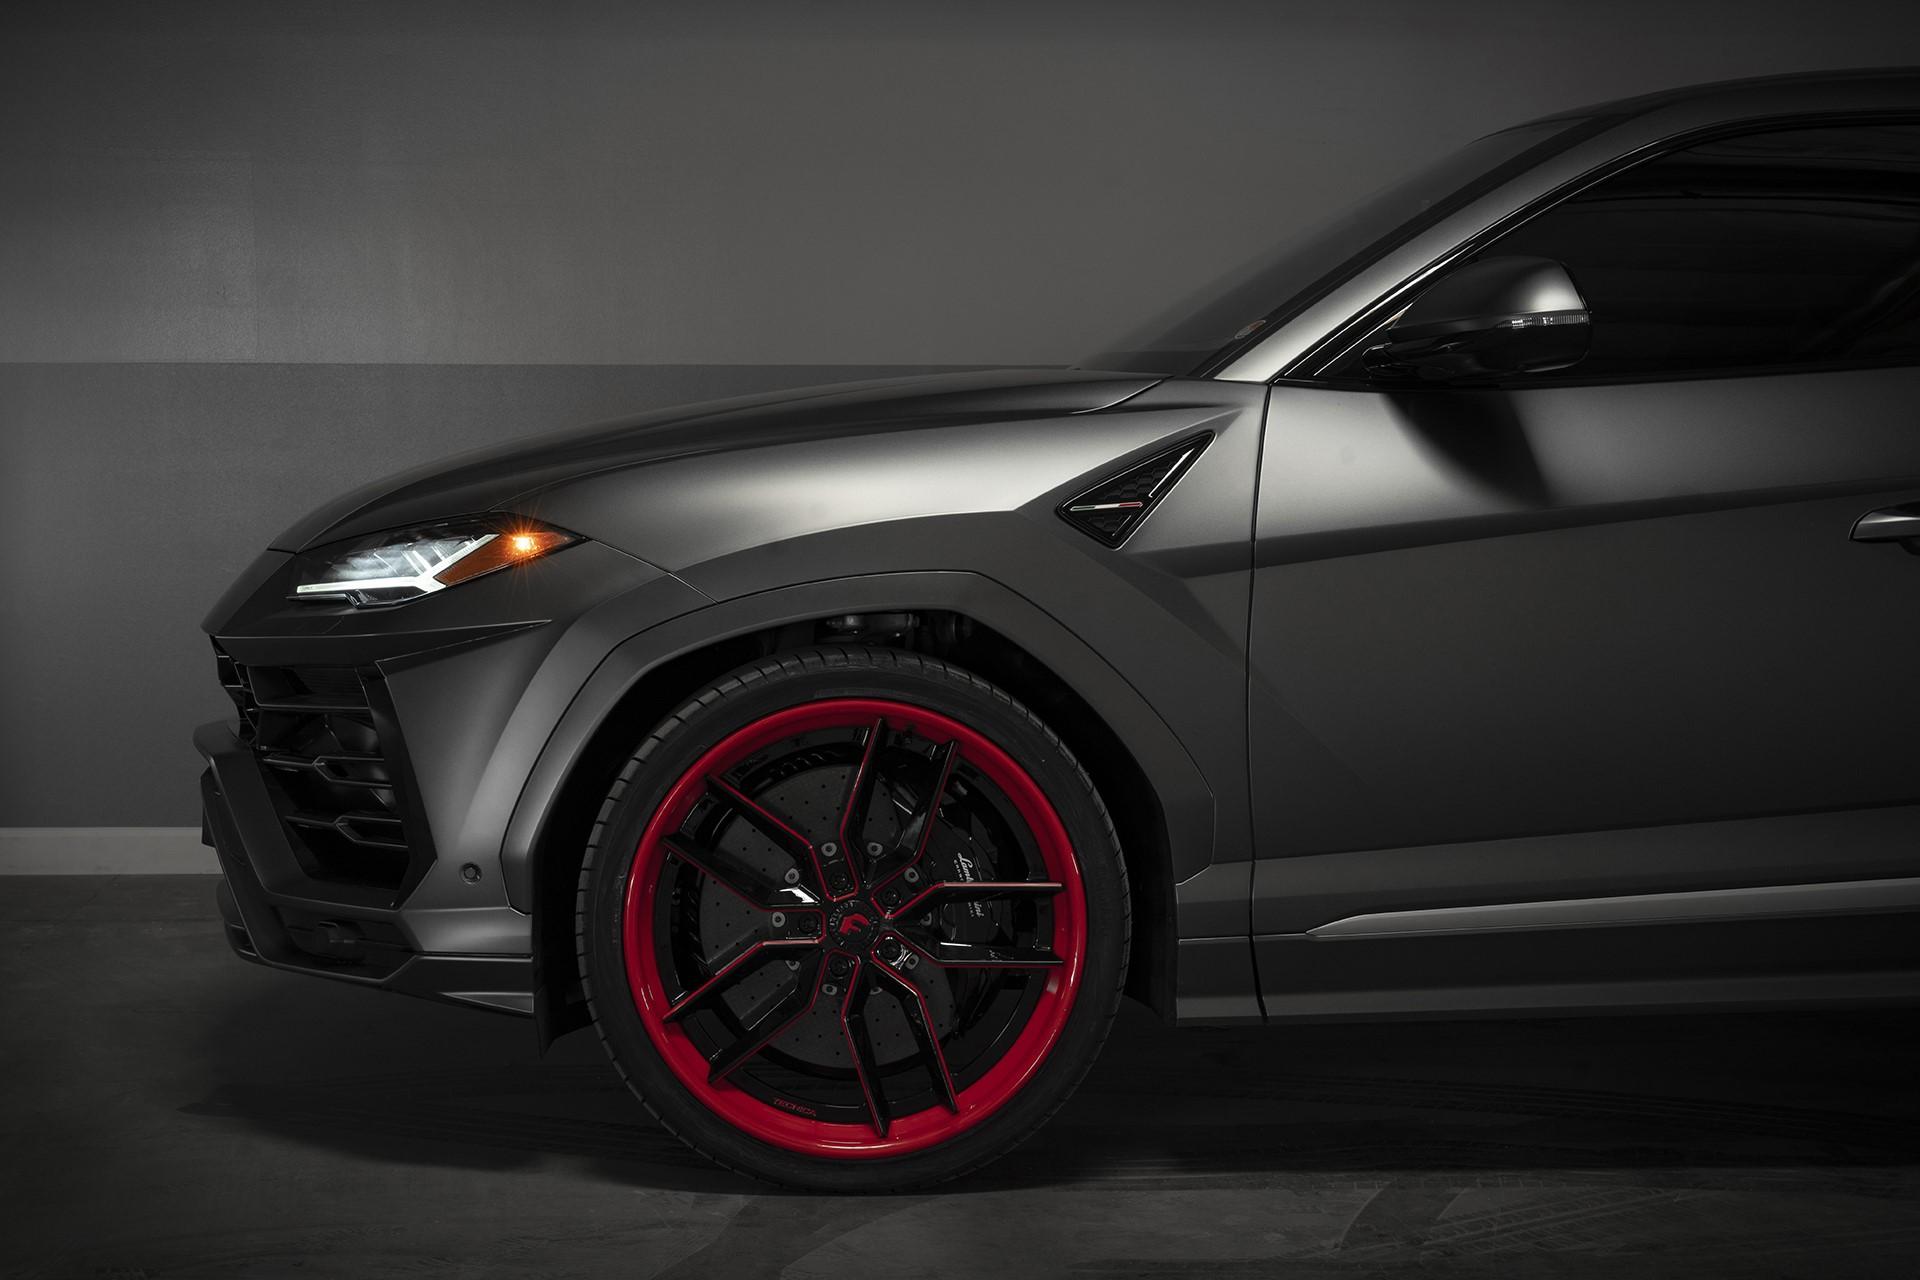 forgiato-custom-wheel-lamborghini-urus-tec_3.9-tecnica-12-21-2018_5c1d5c1351a84_6